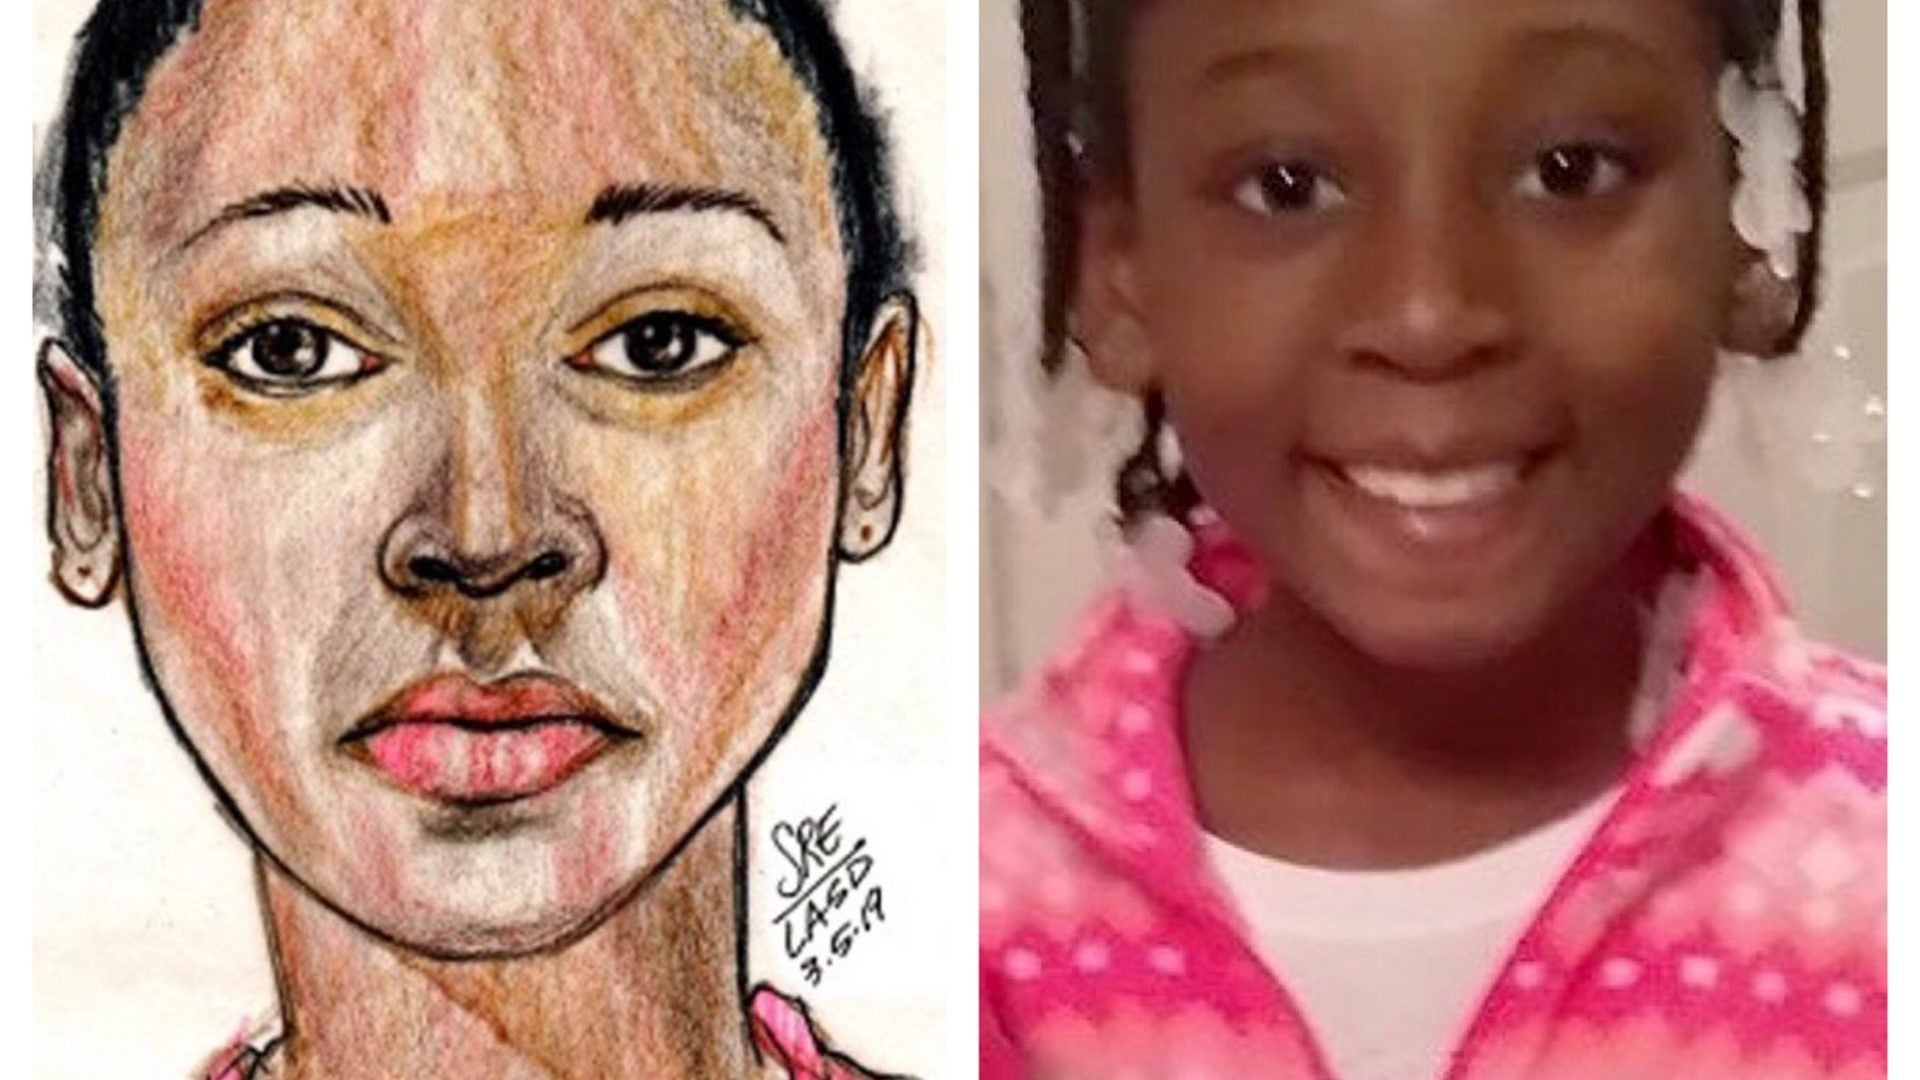 Child Found Dead Near Hacienda Heights, California, Hiking Trail Identified As 9-Year-Old Trinity Love Jones